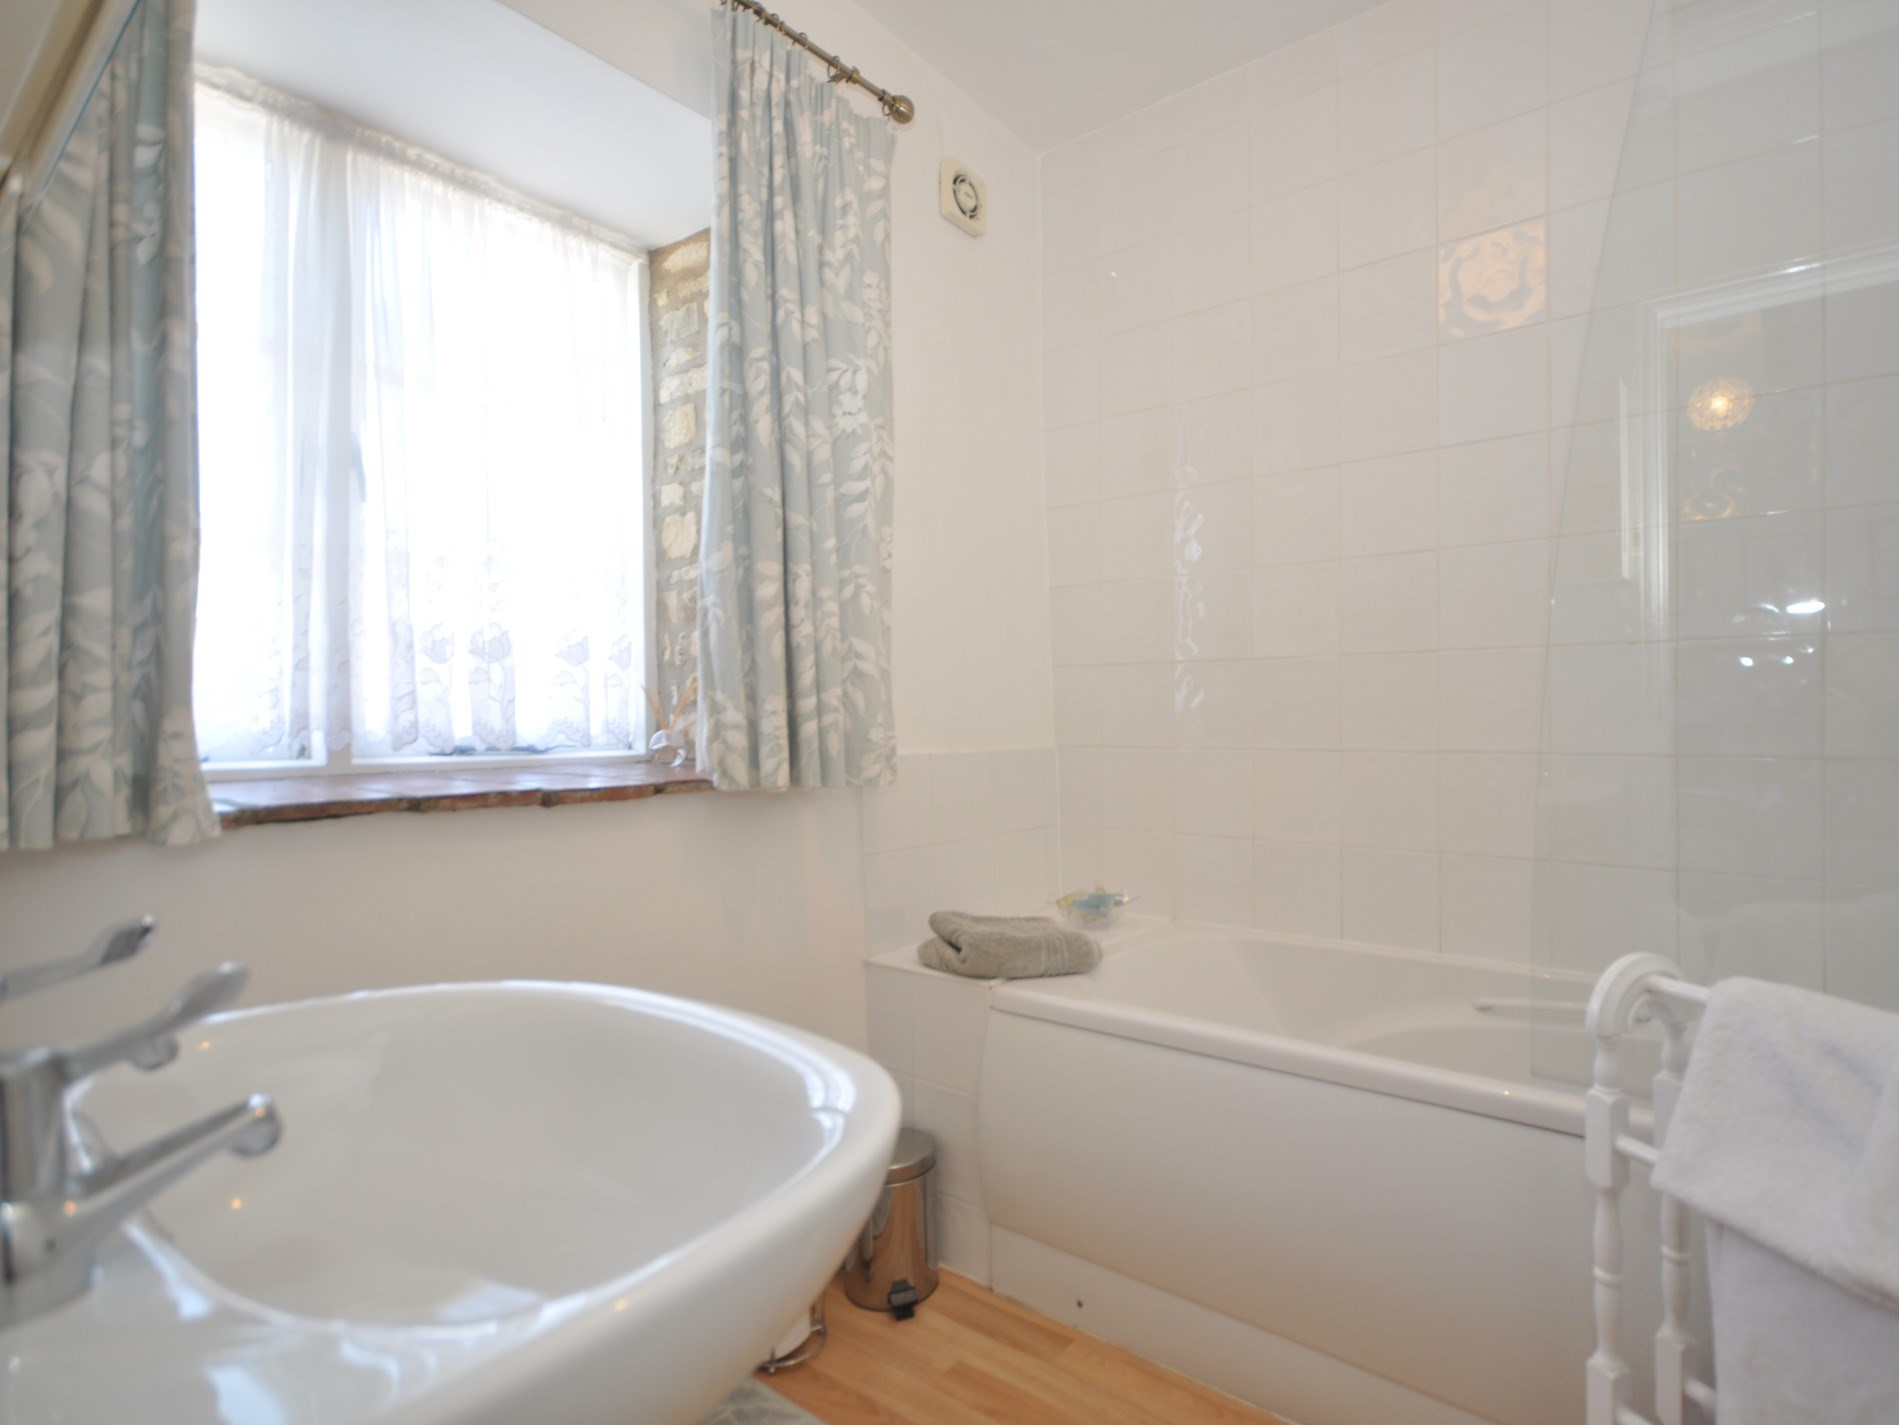 A simple bathroom suite